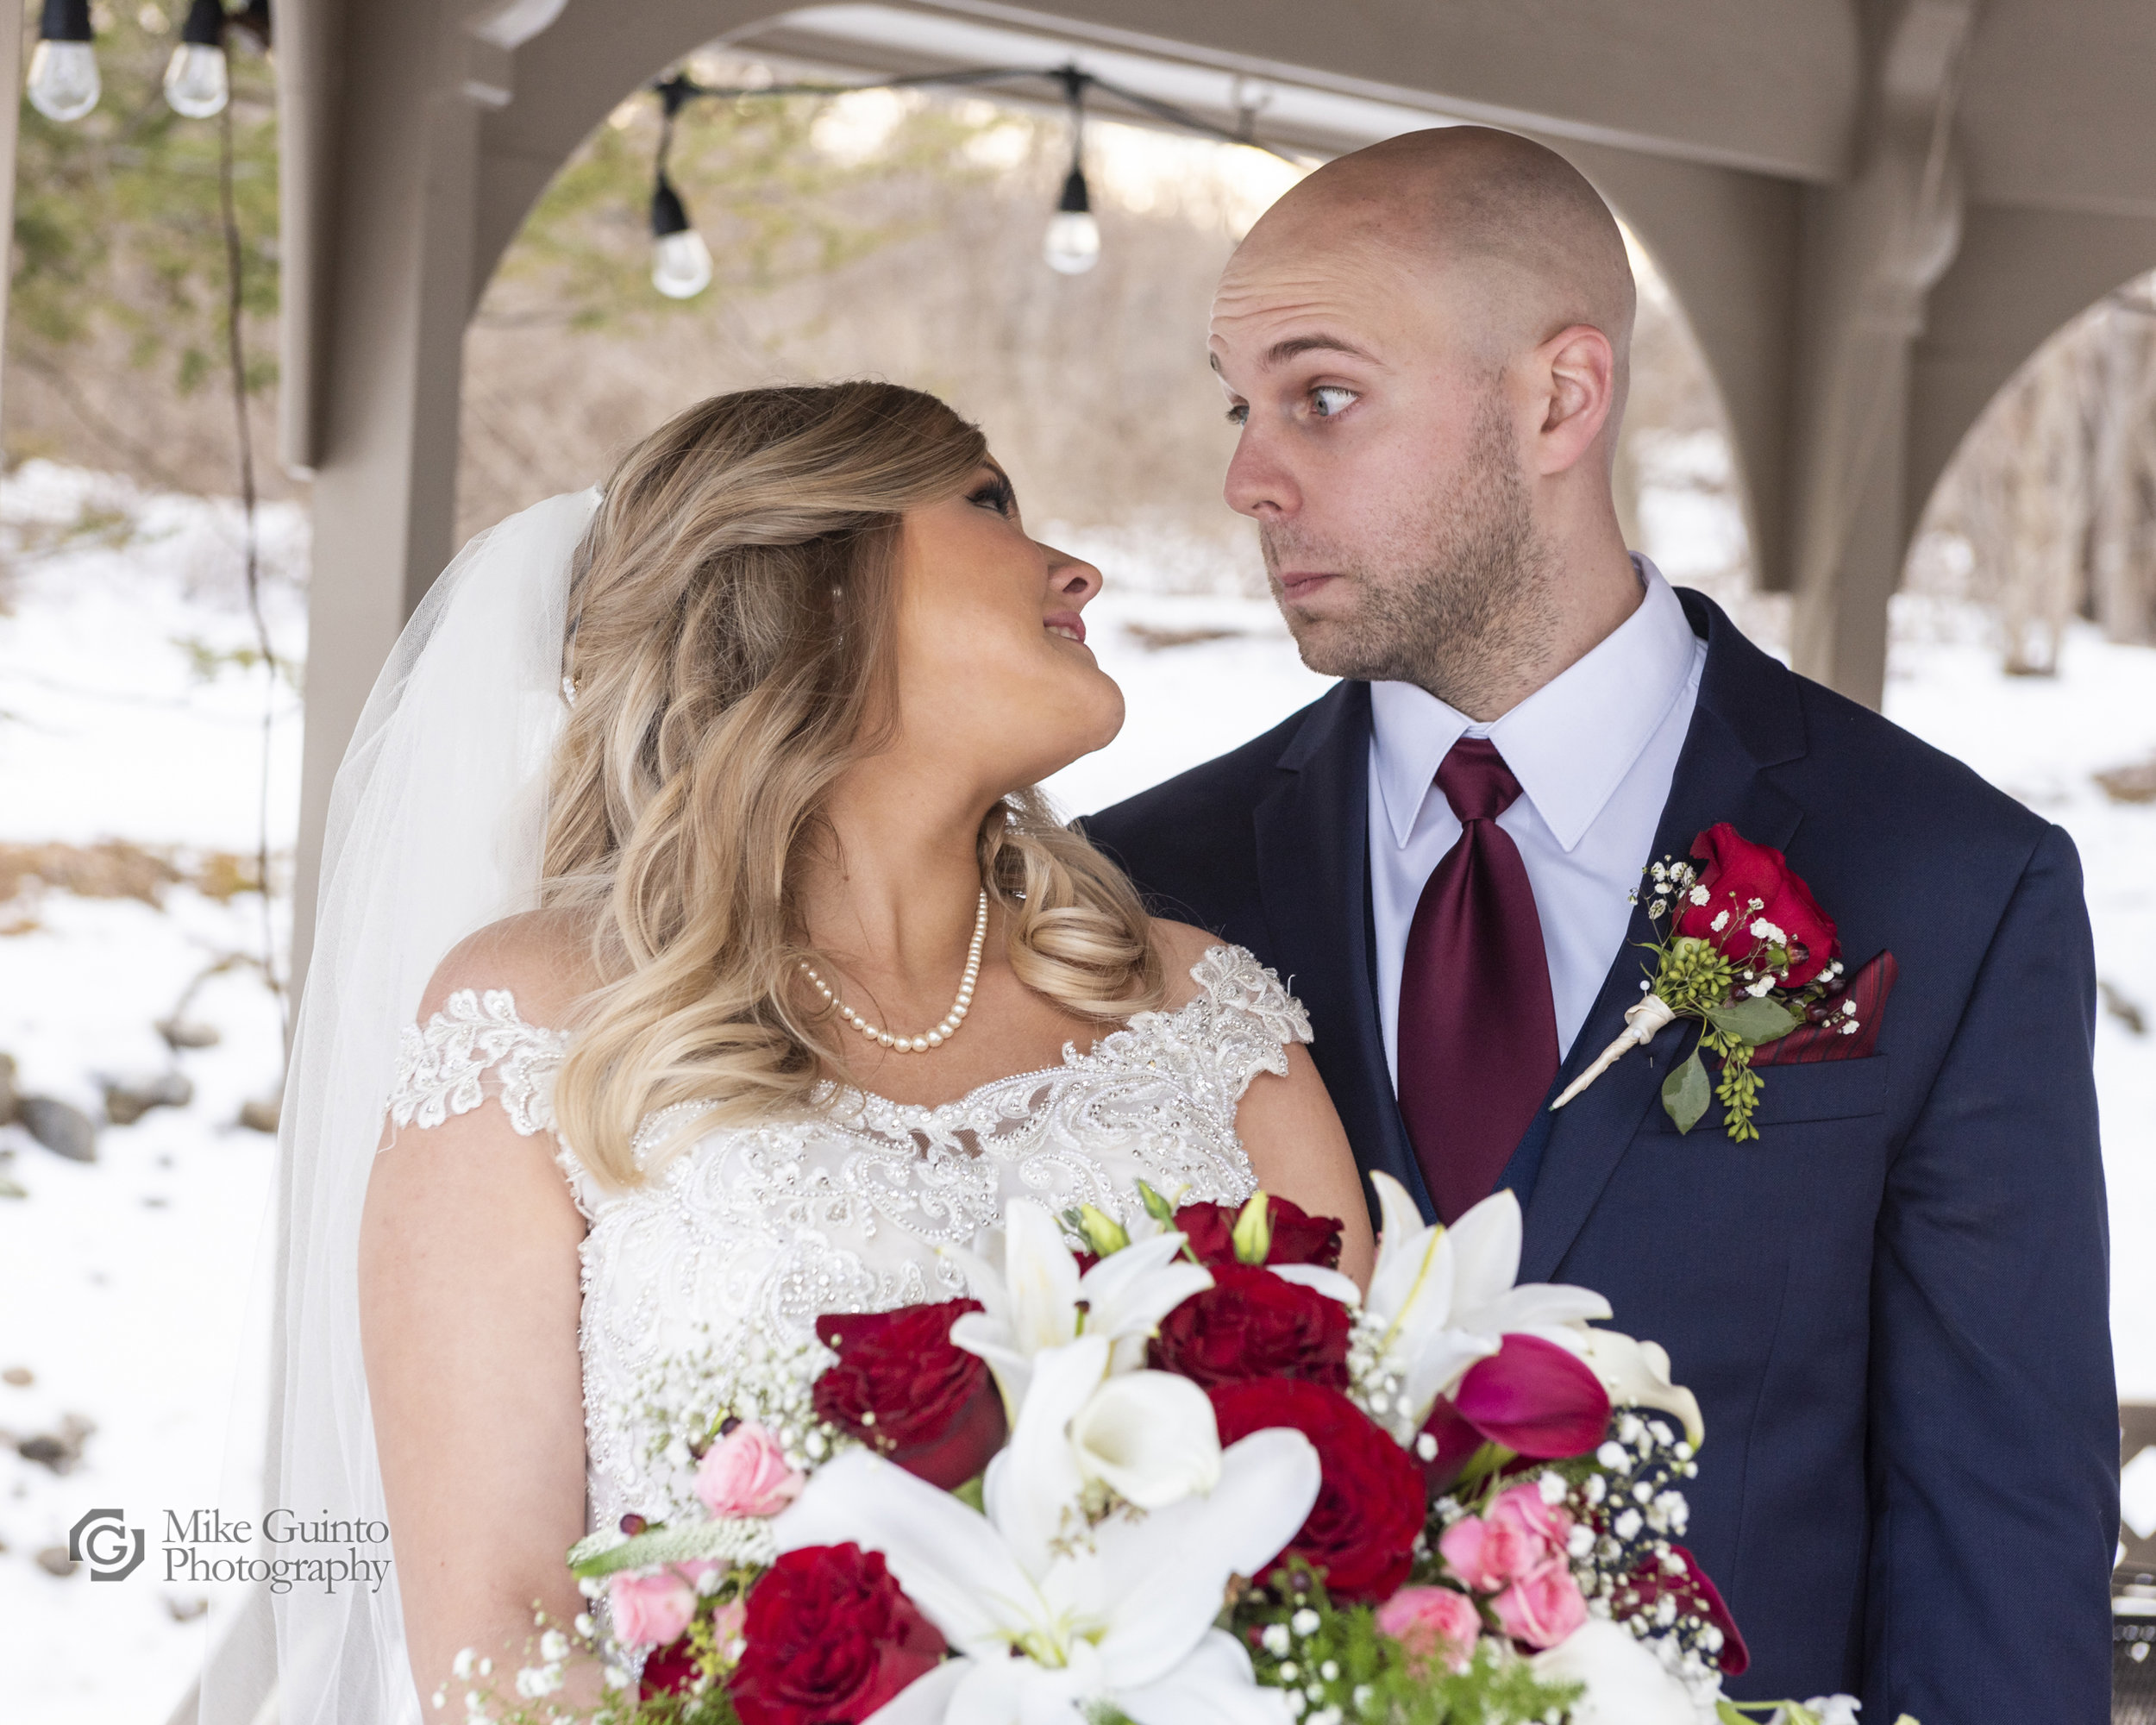 20190223_Wedding_Jaworski_398.jpg